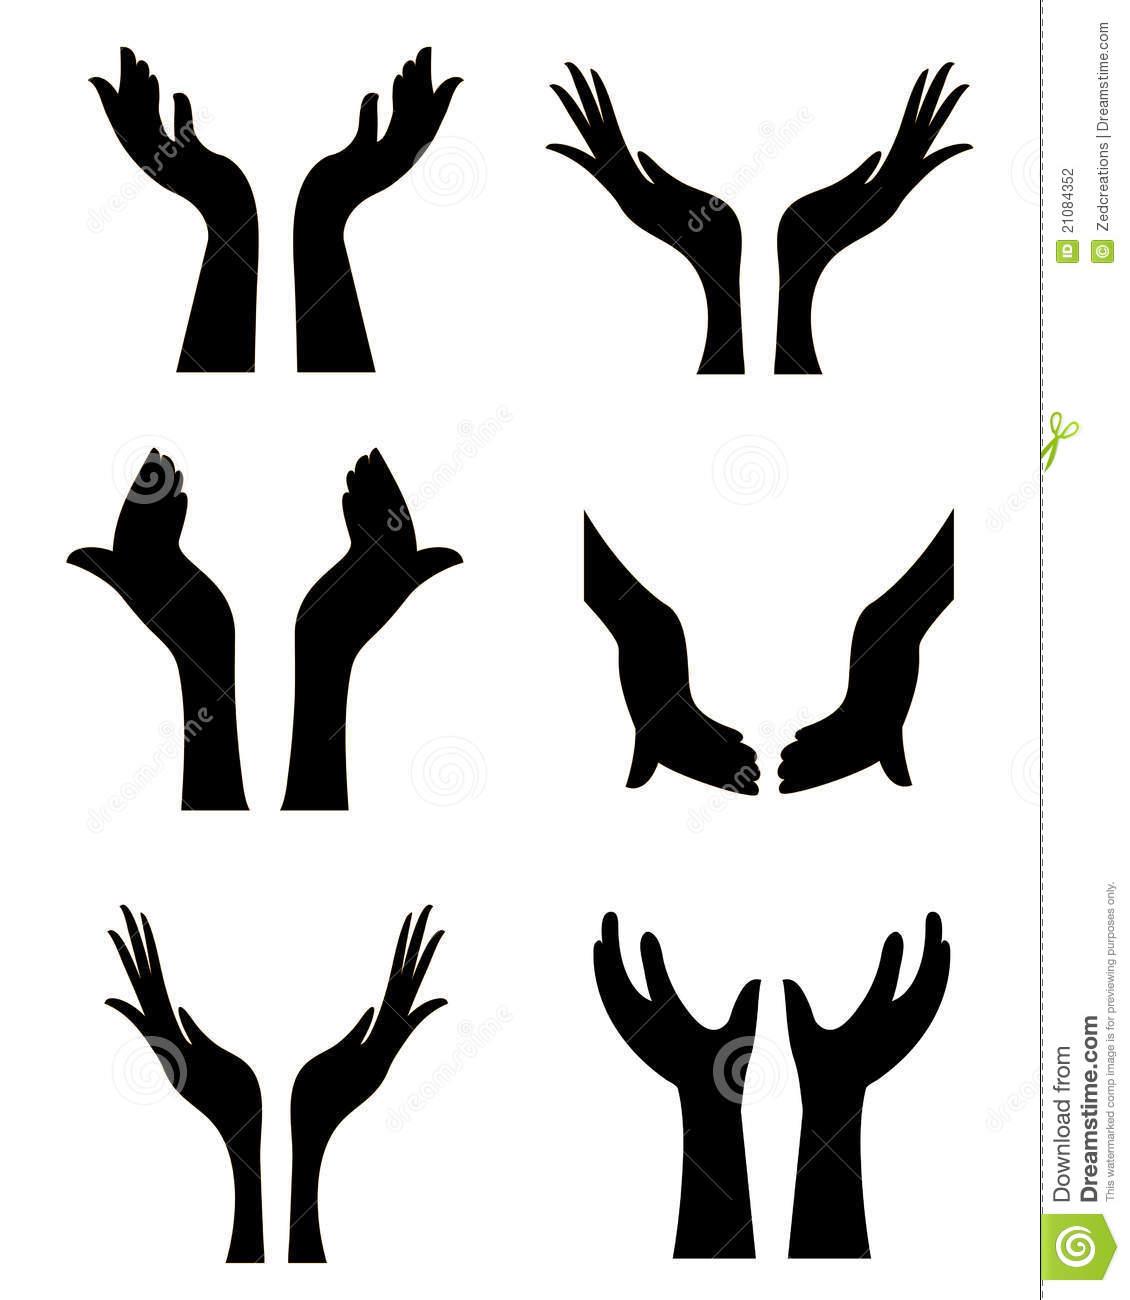 open hands clipart panda free clipart images rh clipartpanda com open hands together clipart open hands clip art free